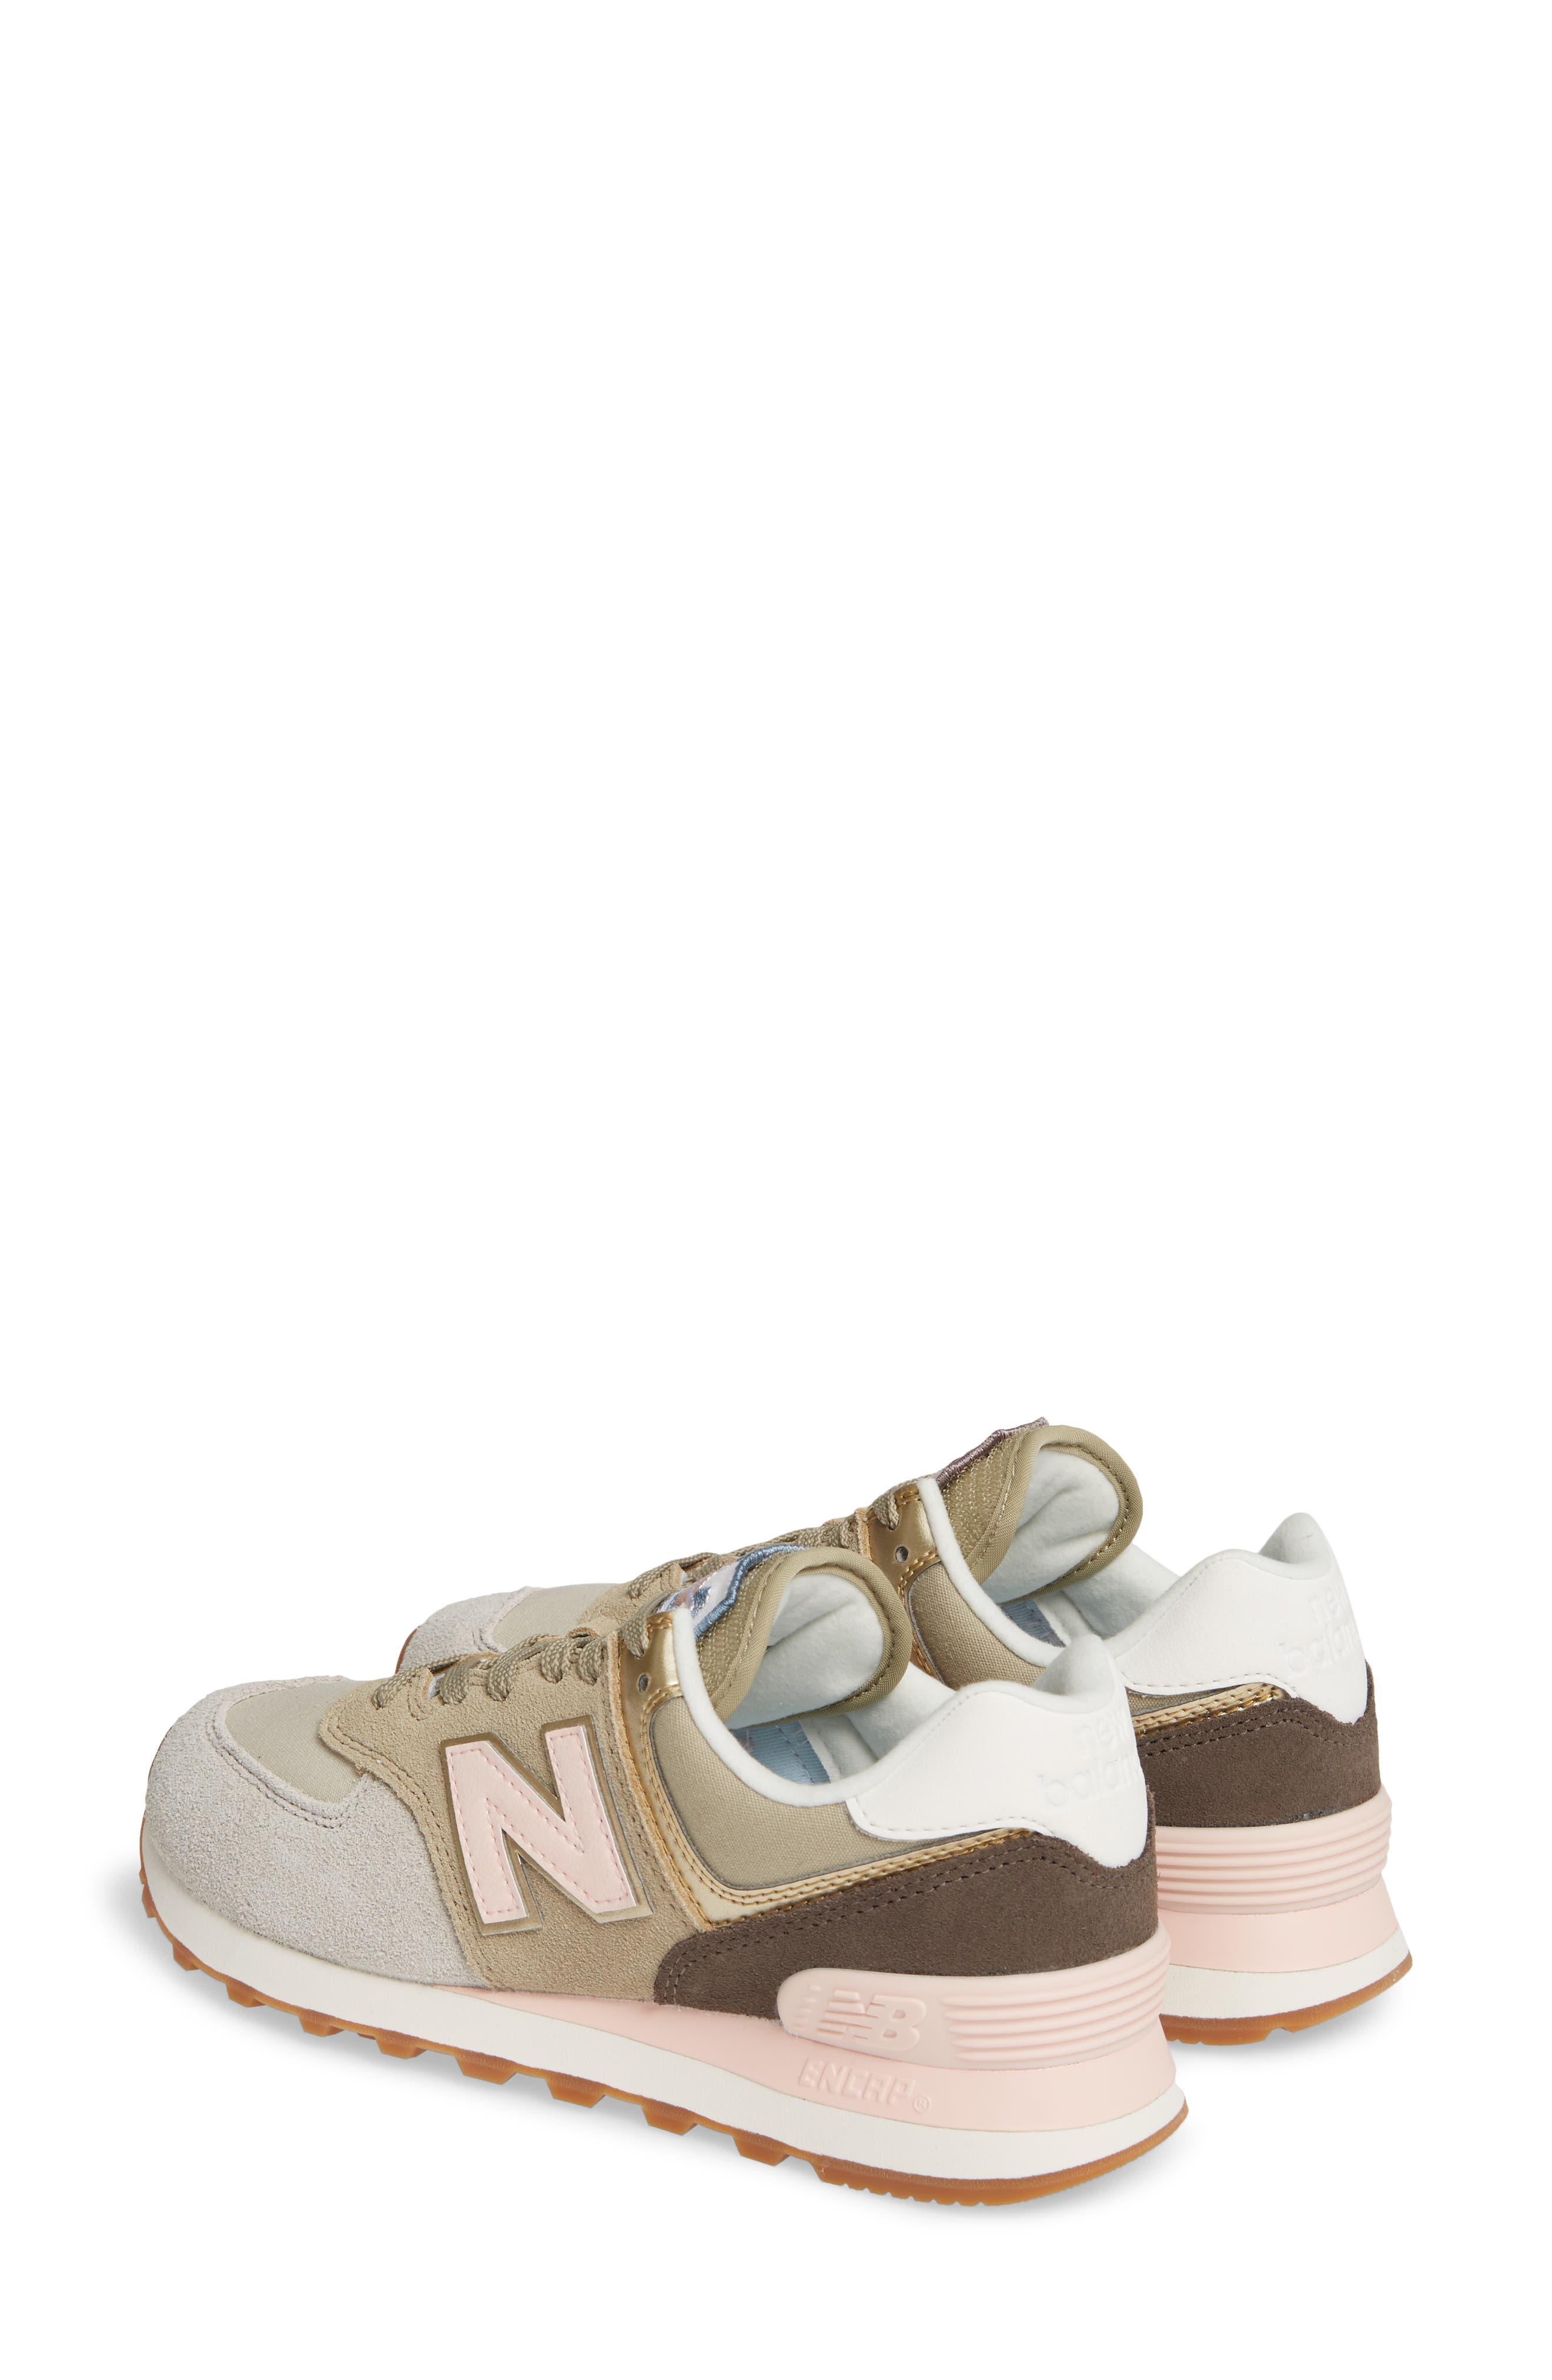 NEW BALANCE, 574 Metallic Patch Sneaker, Alternate thumbnail 2, color, LIGHT CLIFF GREY